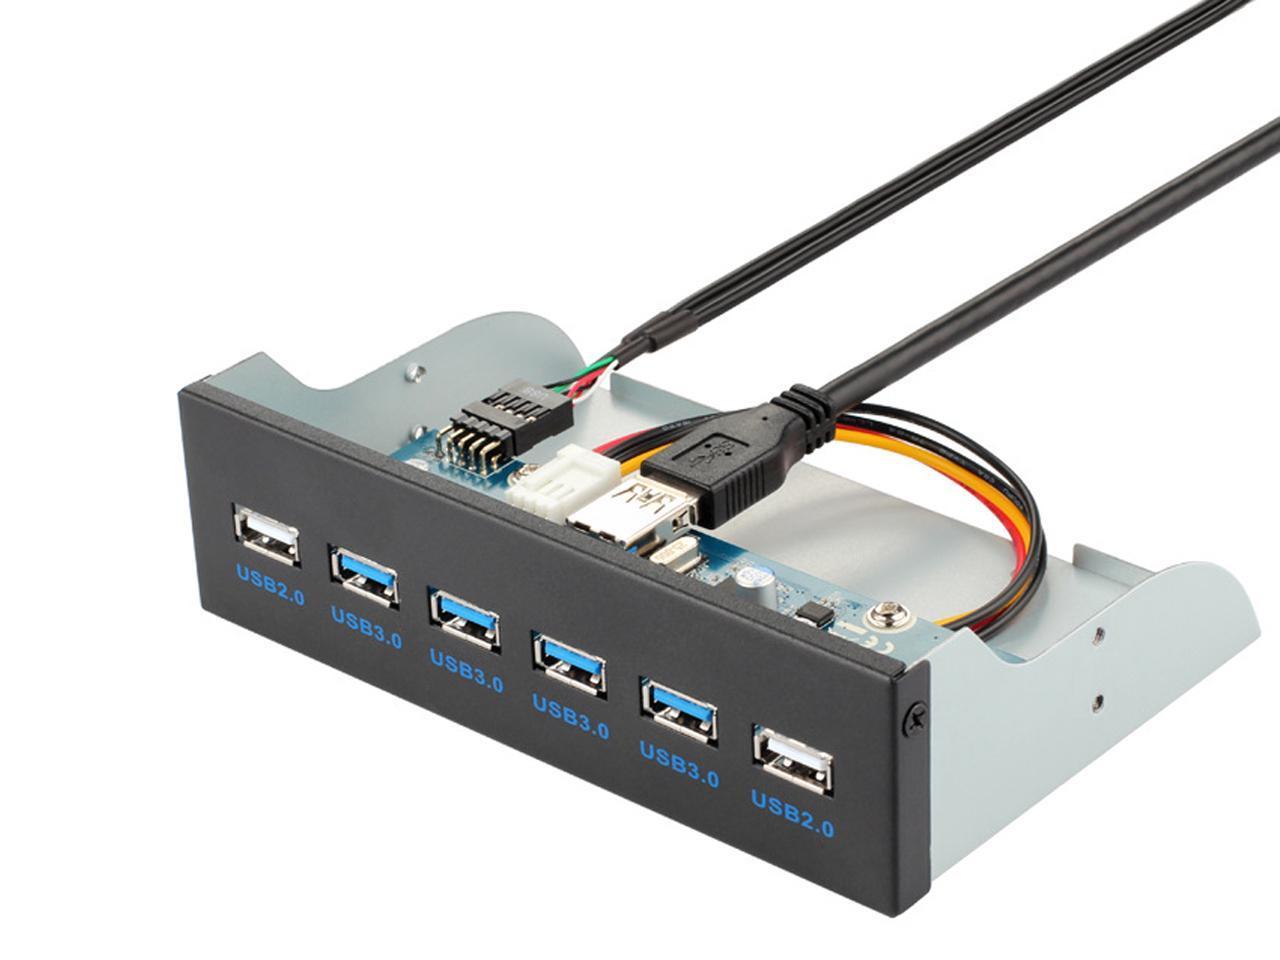 USB 2.0 External CD//DVD Drive for Compaq presario v3255tu